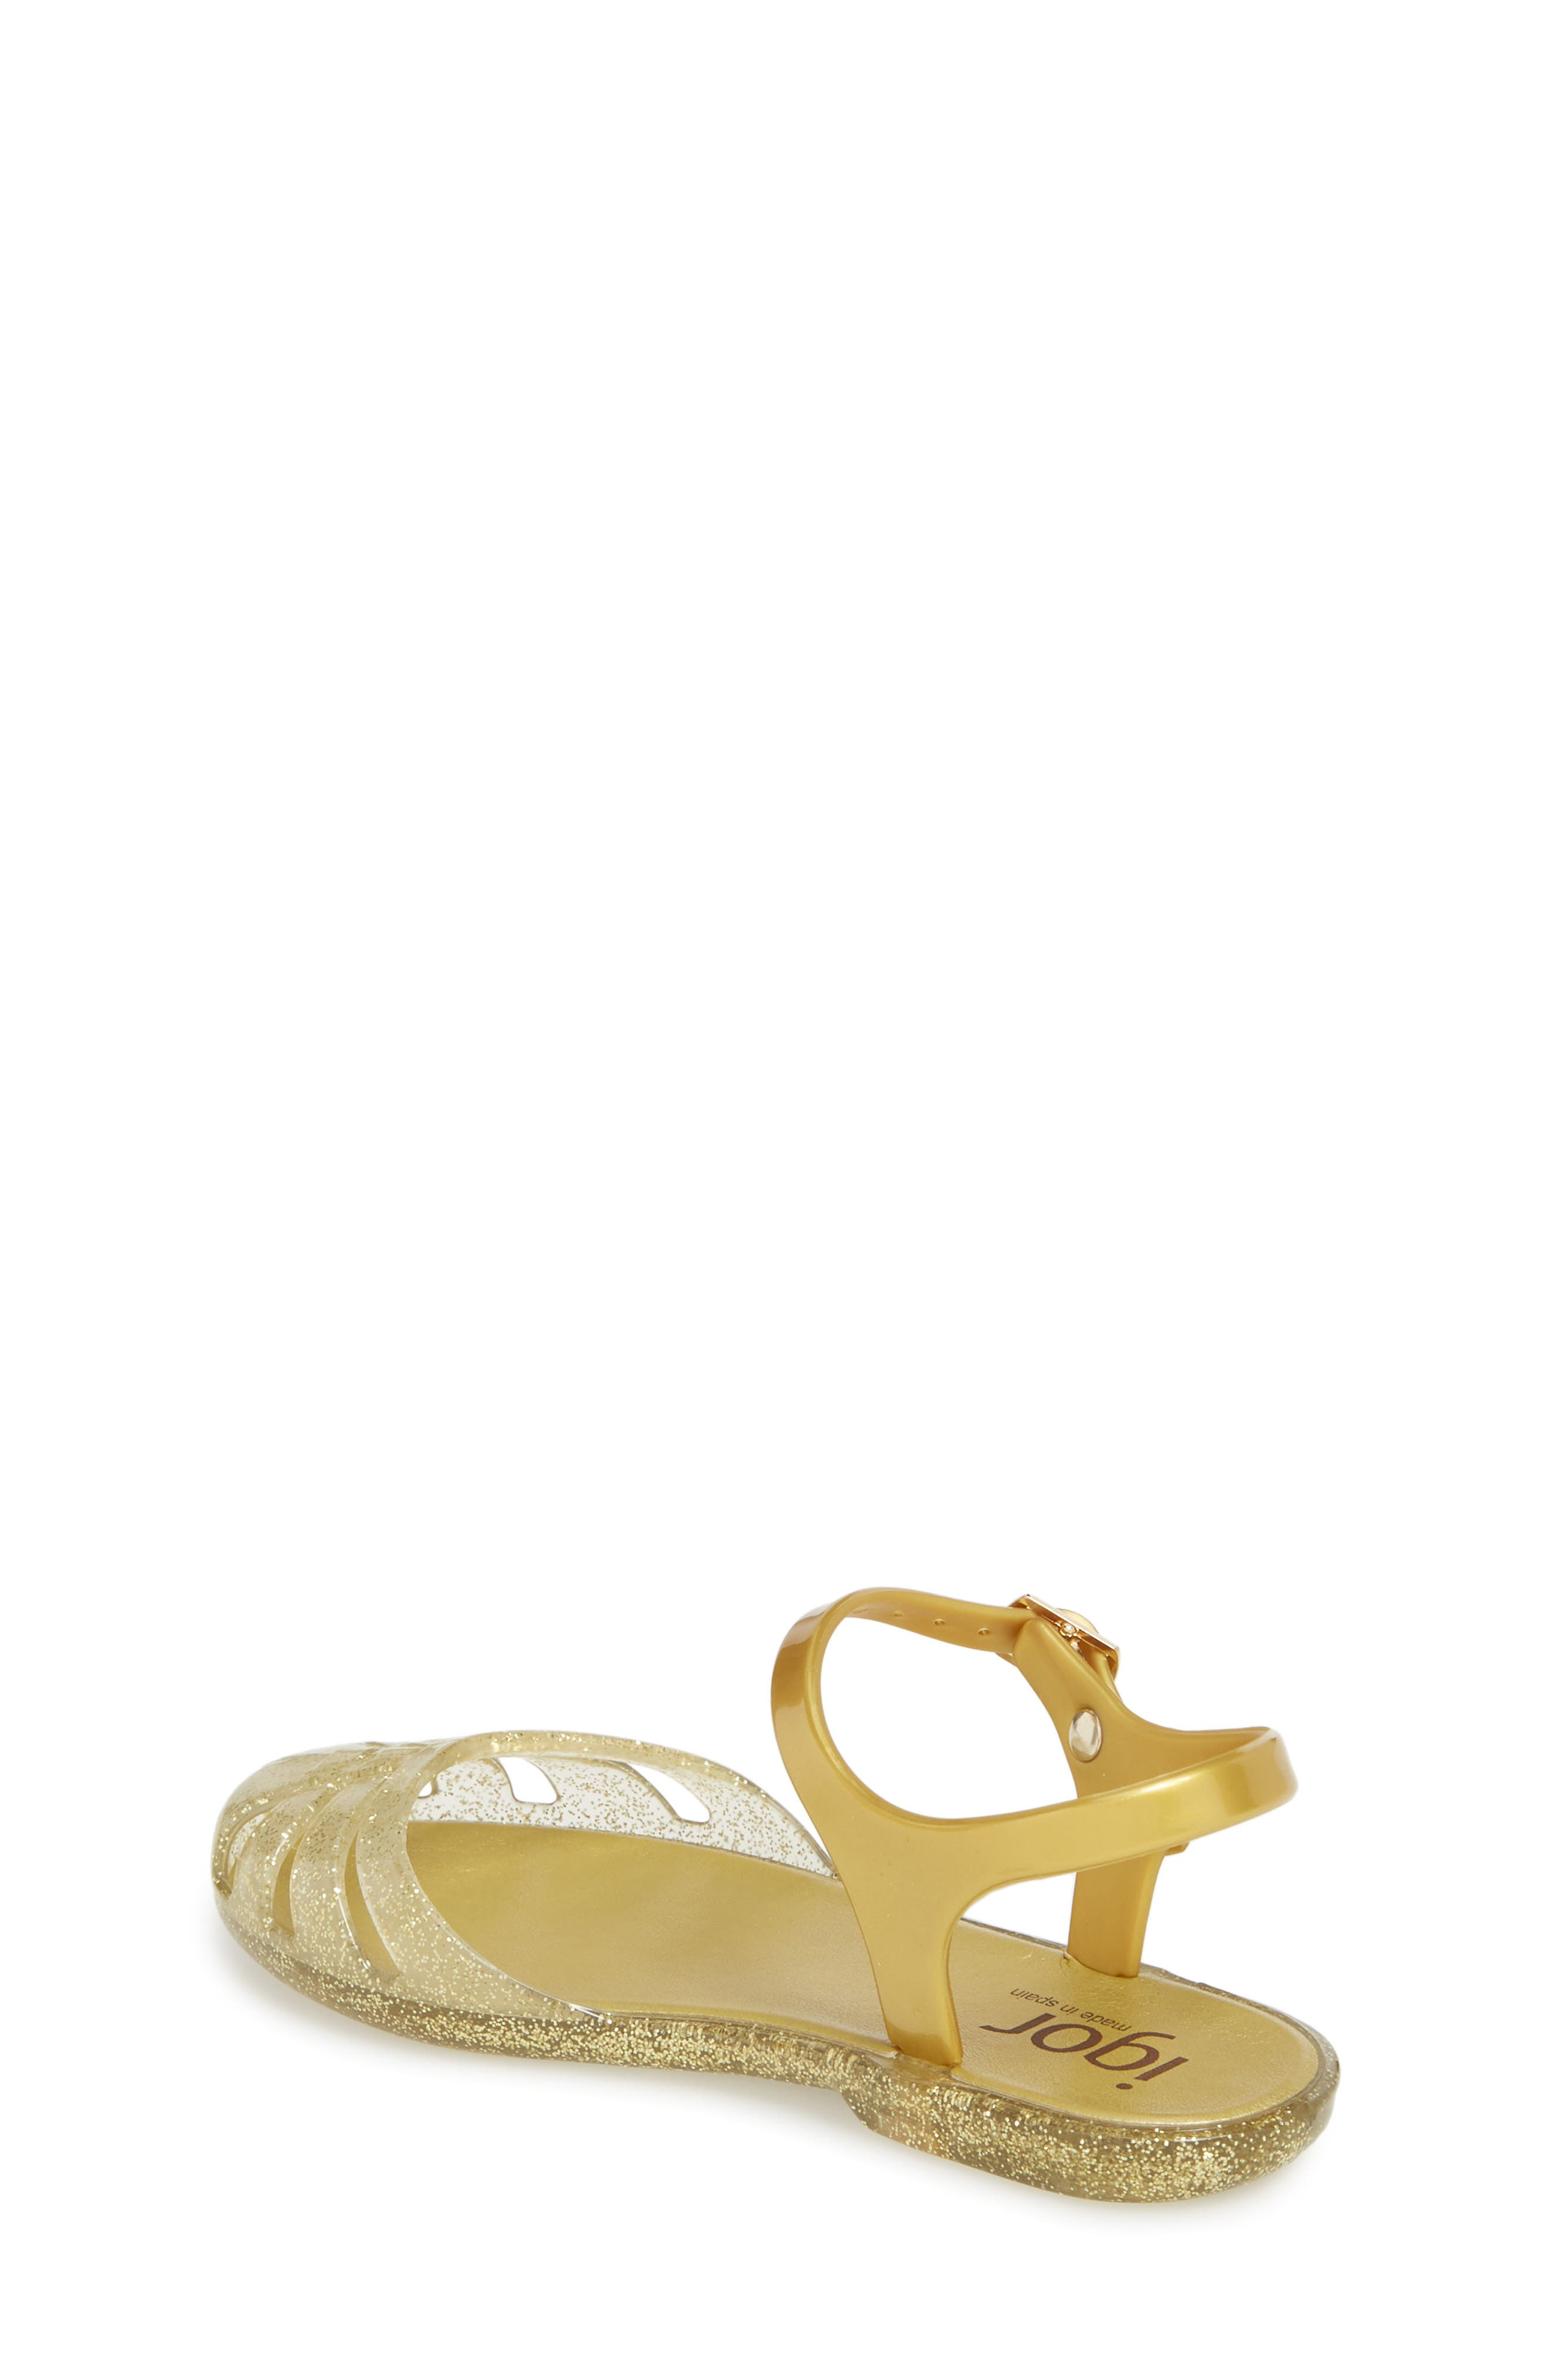 'Mara Mini' Glitter Jelly Sandal,                             Alternate thumbnail 2, color,                             Gold Glitter